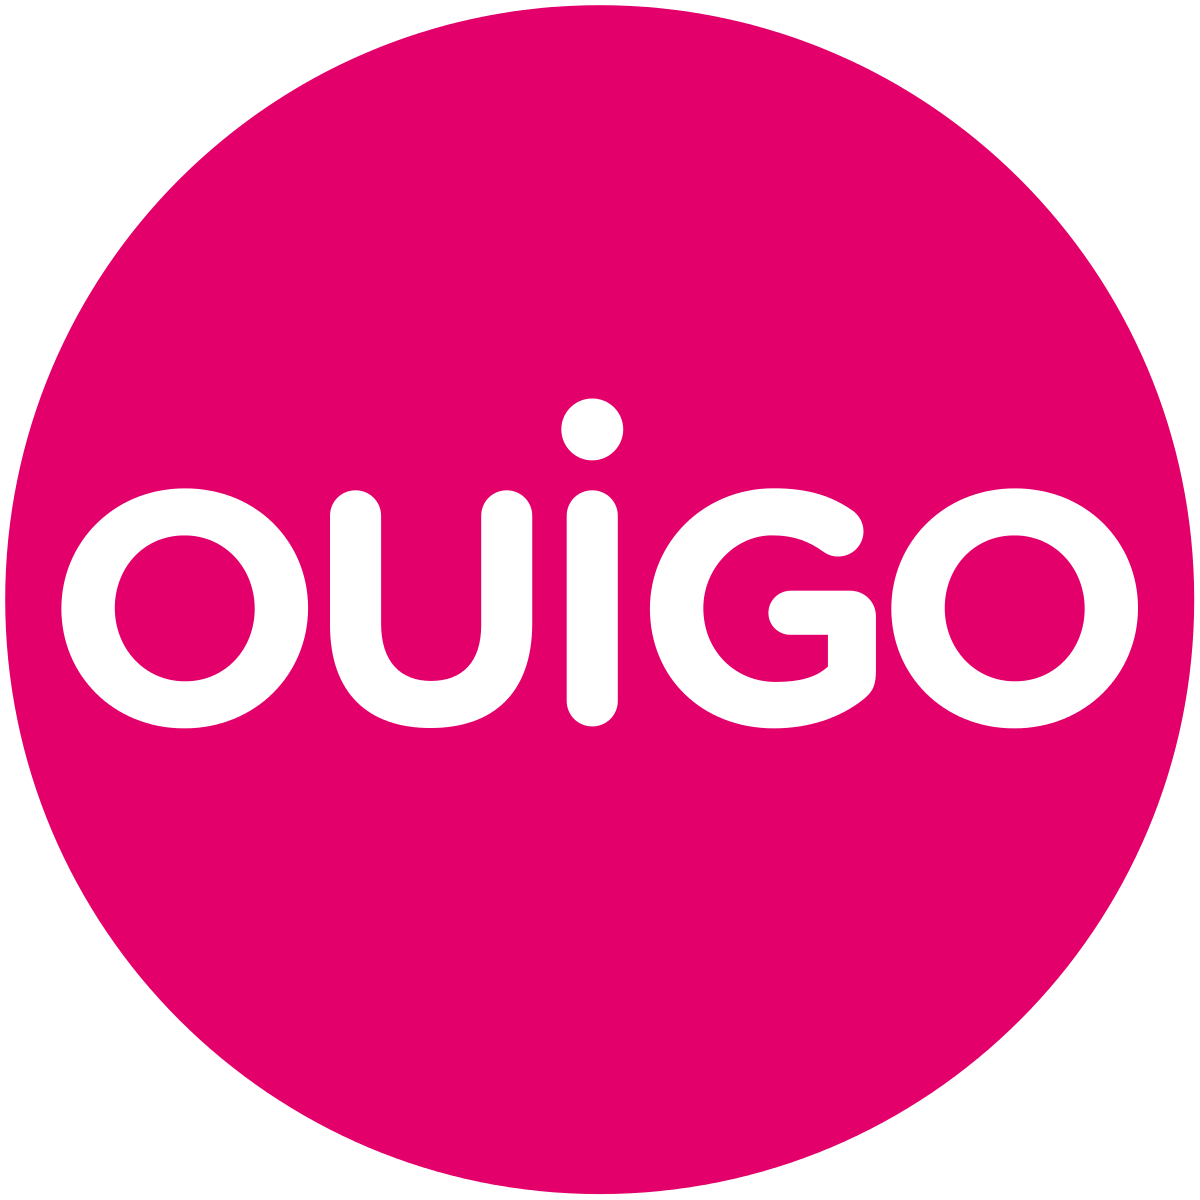 Télephone information entreprise  OUIGO